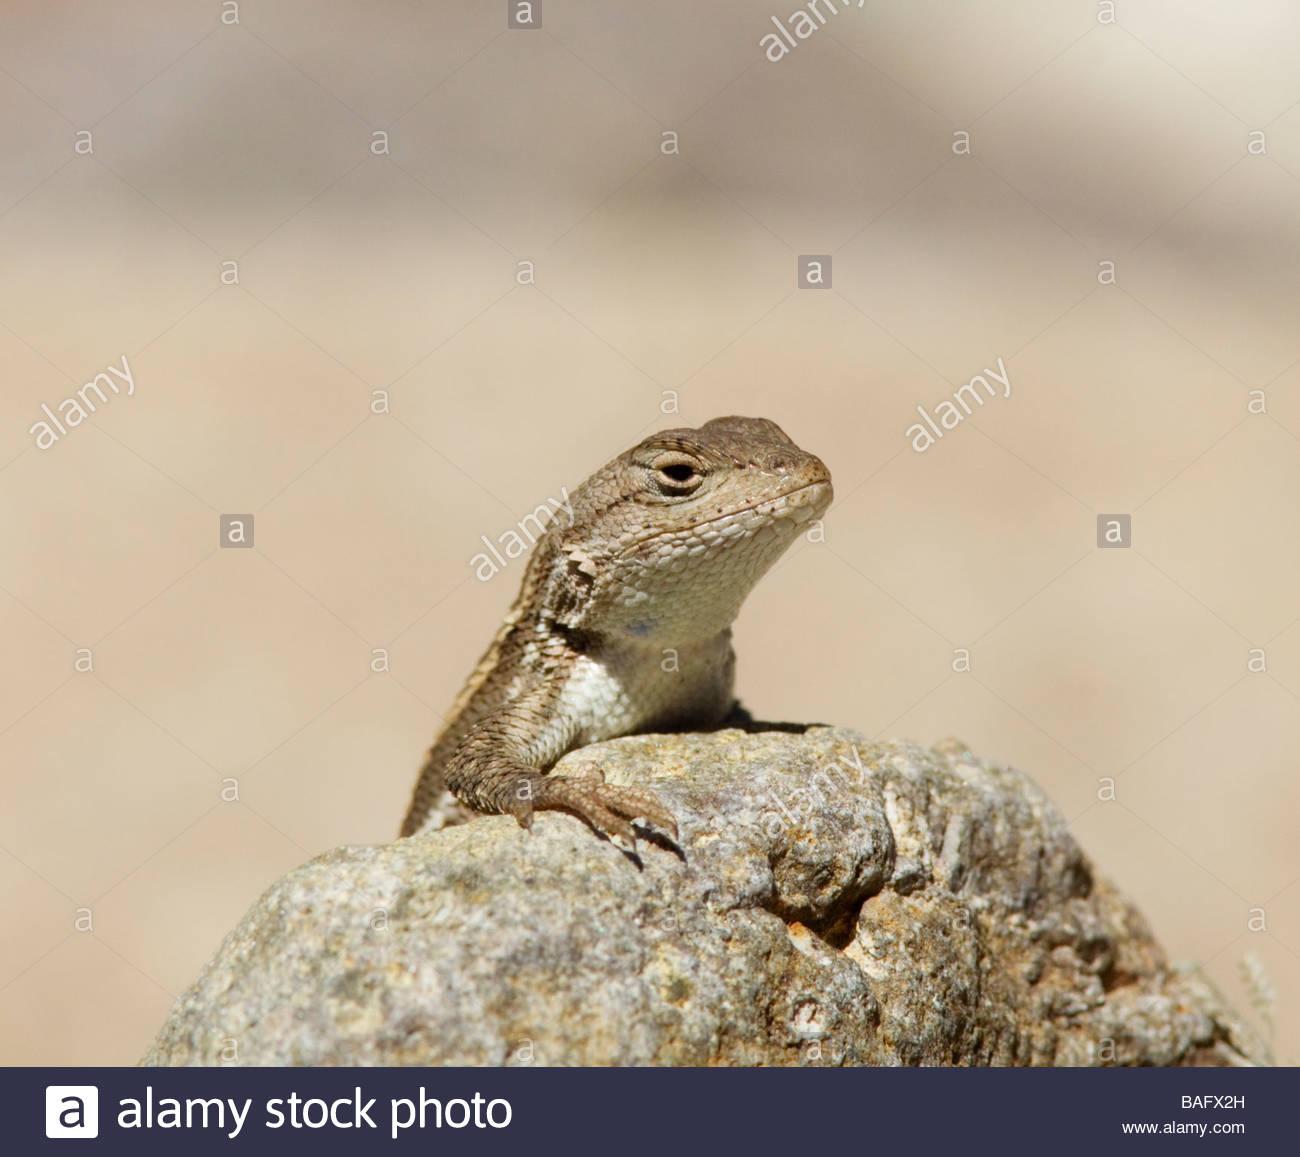 Striped Plateau Lizard Sceloporus virgatus peering over rock throat showing note blue spot Stock Photo